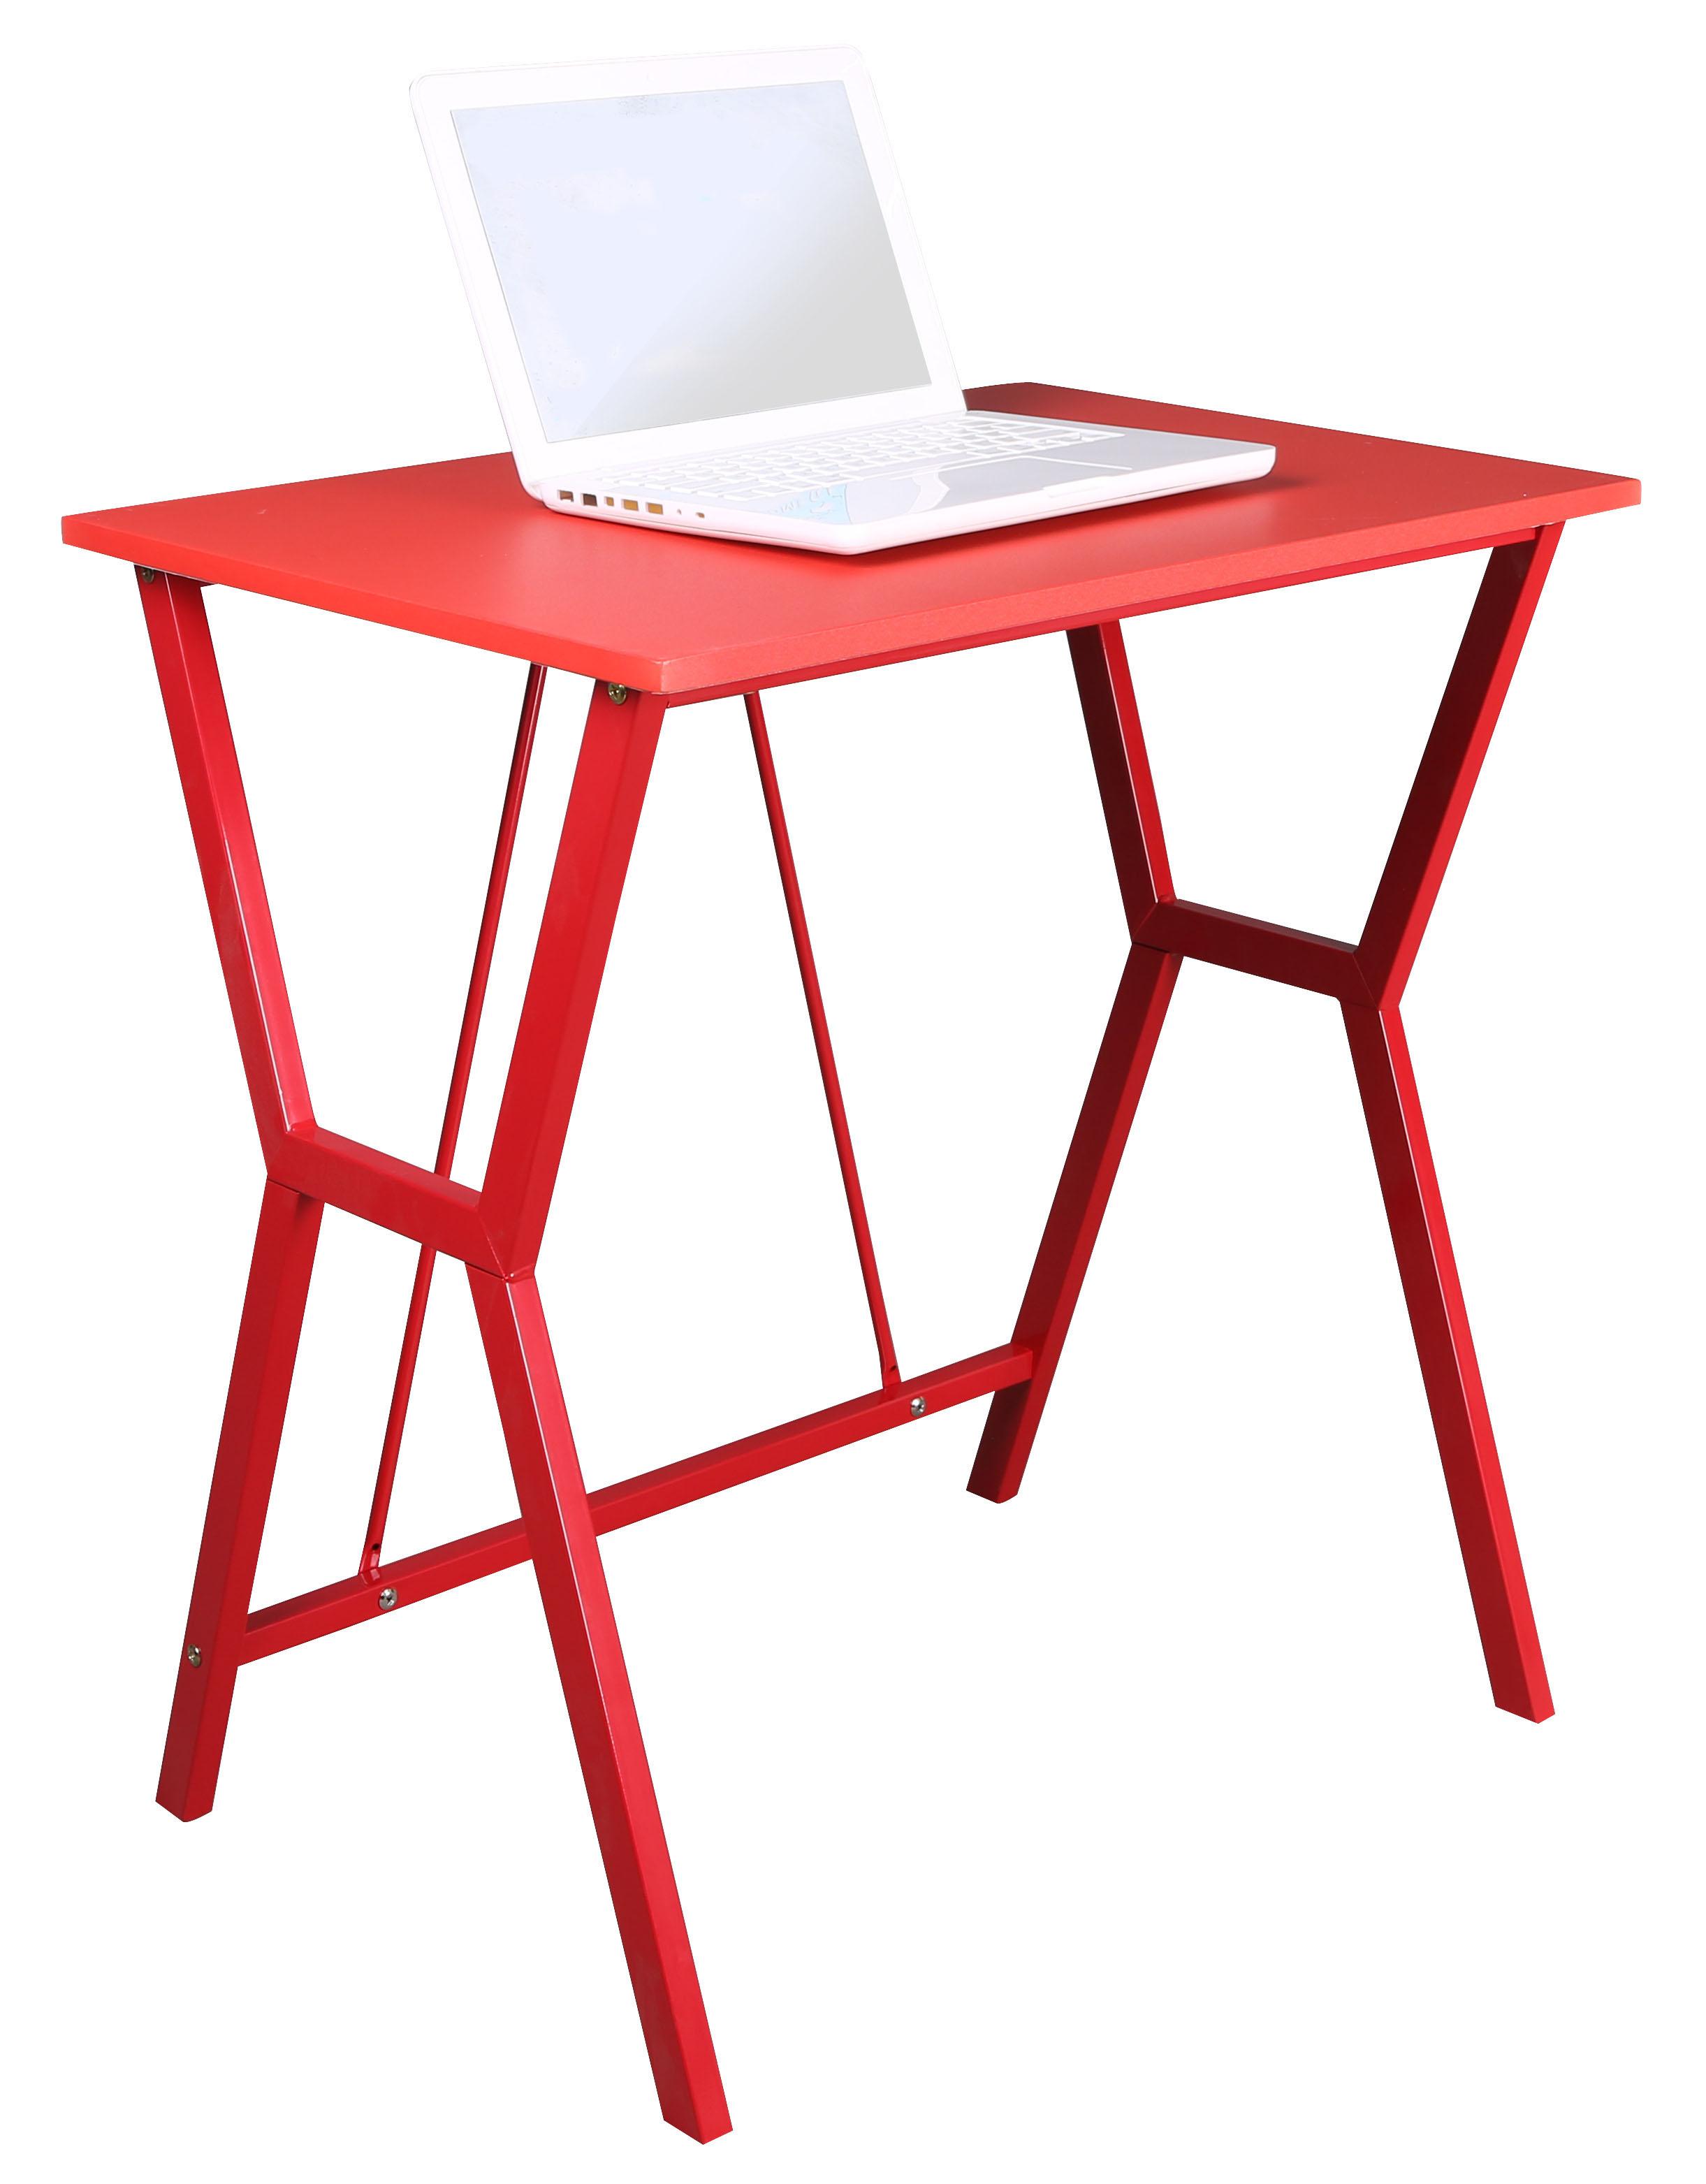 Bentley Red Office Workstation Computer Laptop Desk With Steel Frame Ebay